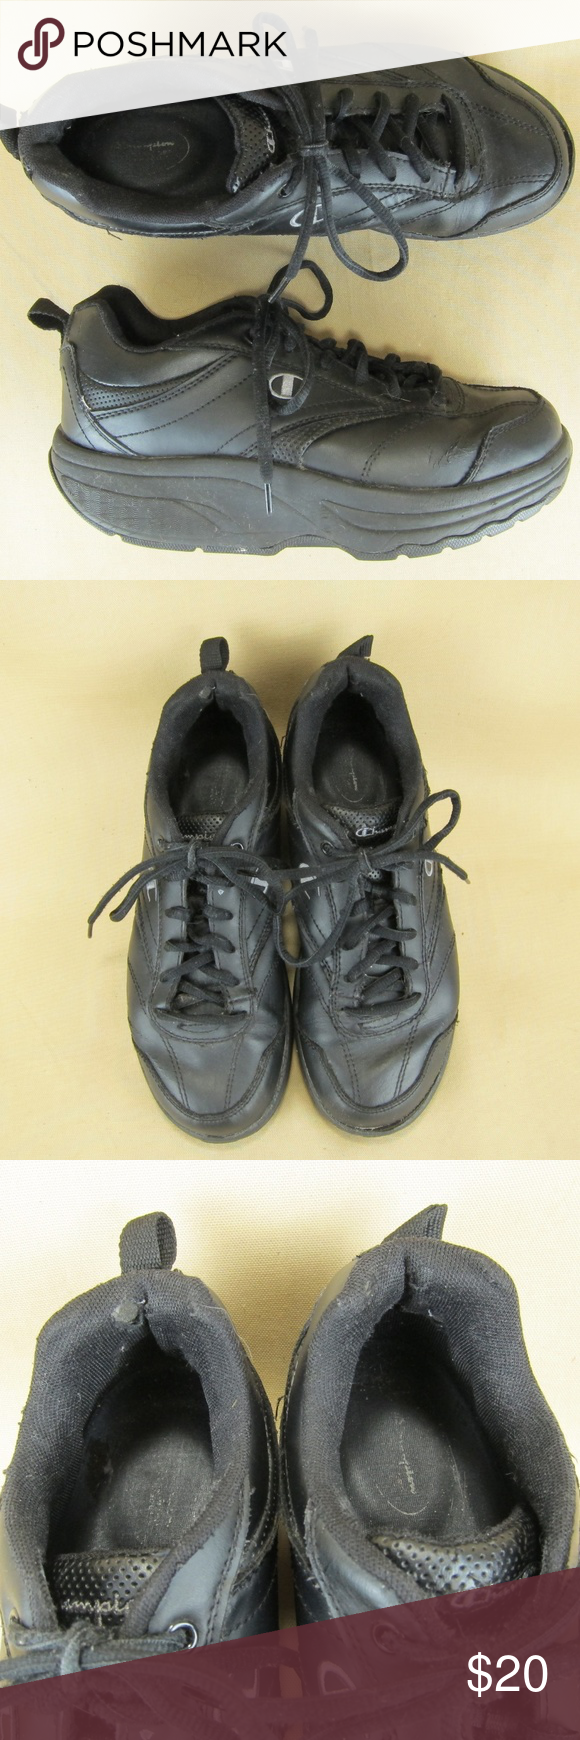 Champion Safe Step Slip Resistant Work